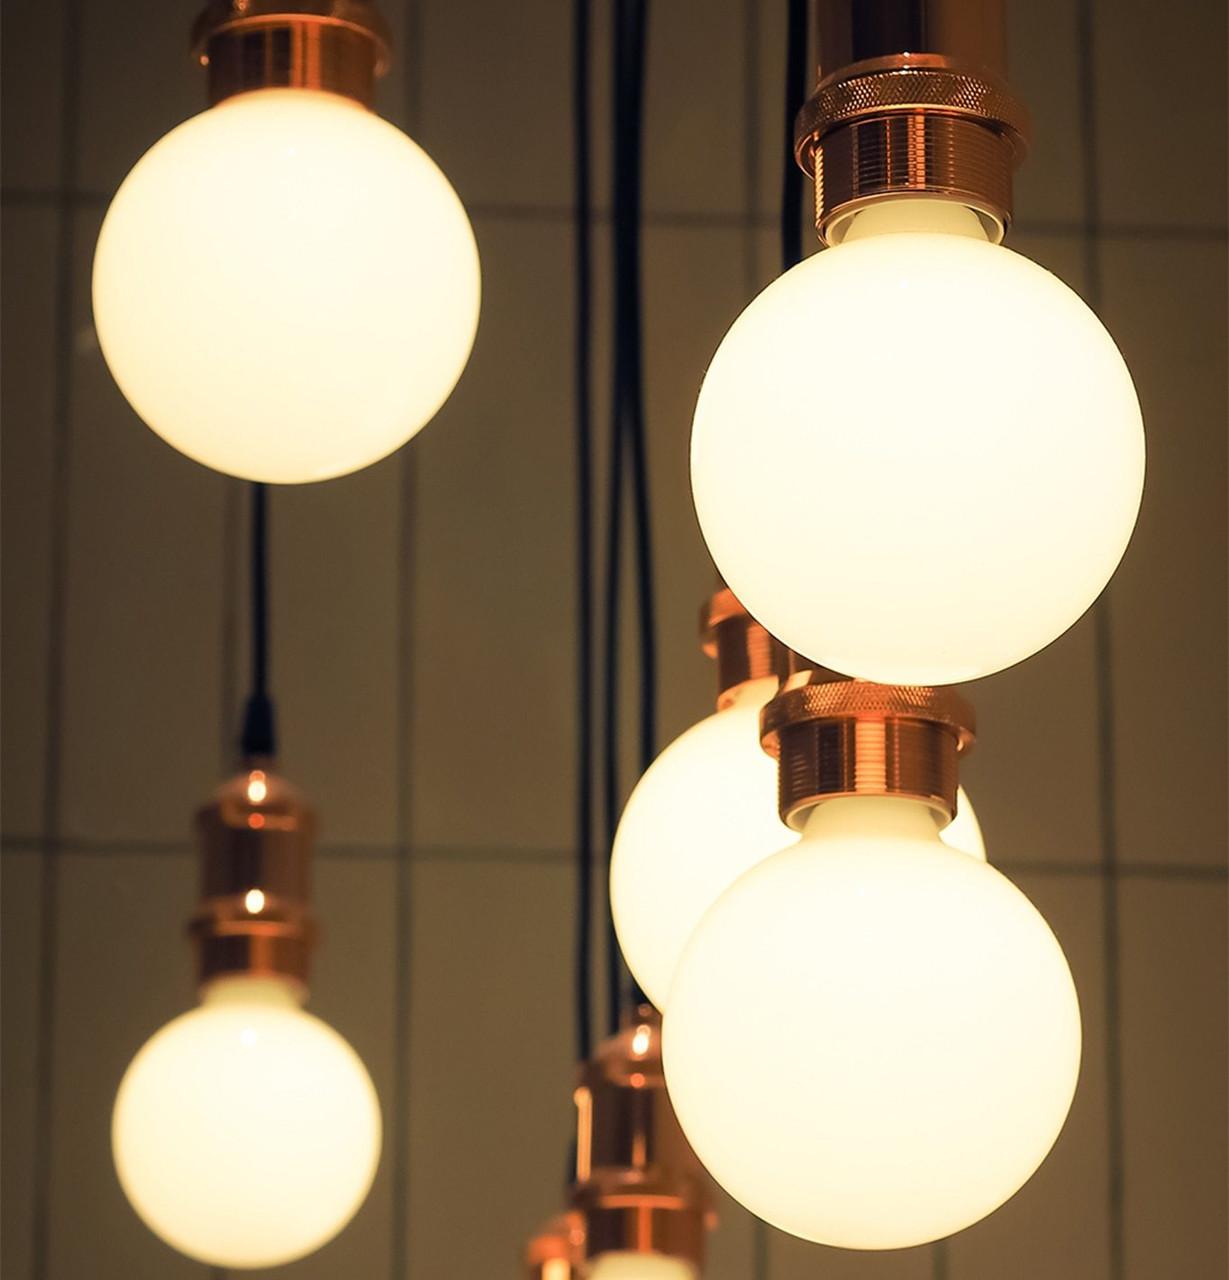 Crompton Lamps LED G80 5W Light Bulbs